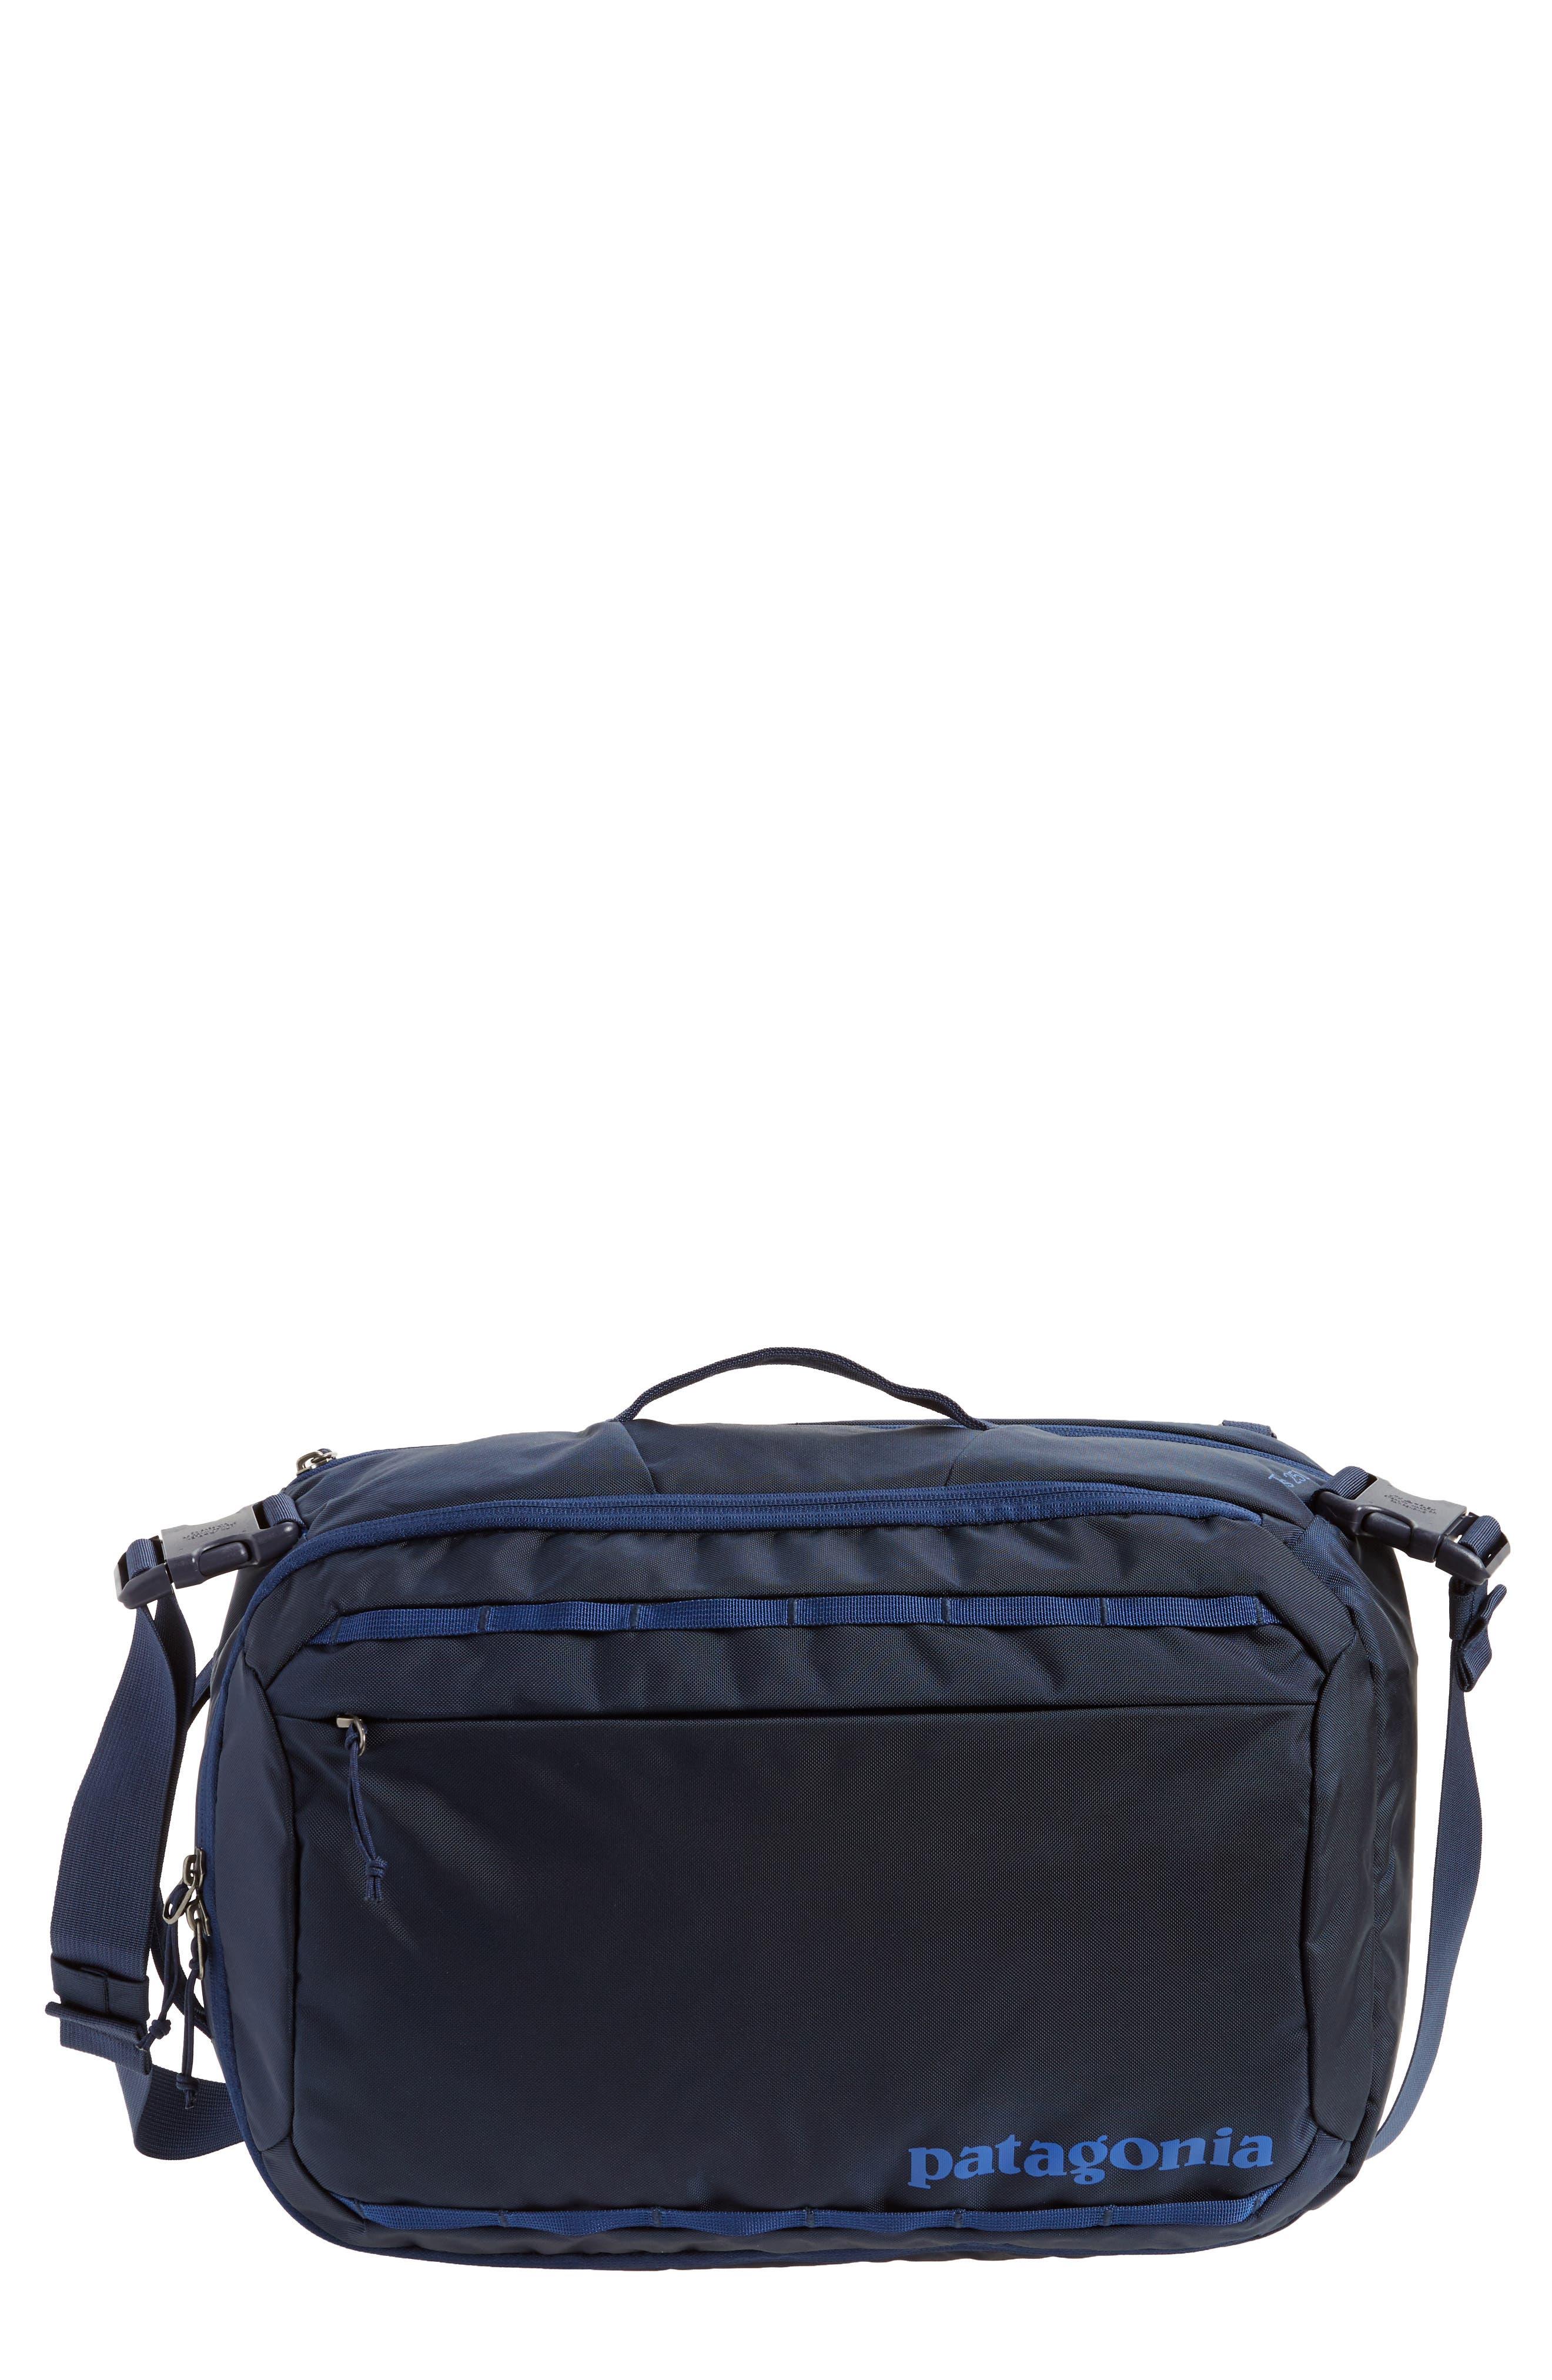 Alternate Image 1 Selected - Patagonia Tres 25-Liter Convertible Backpack